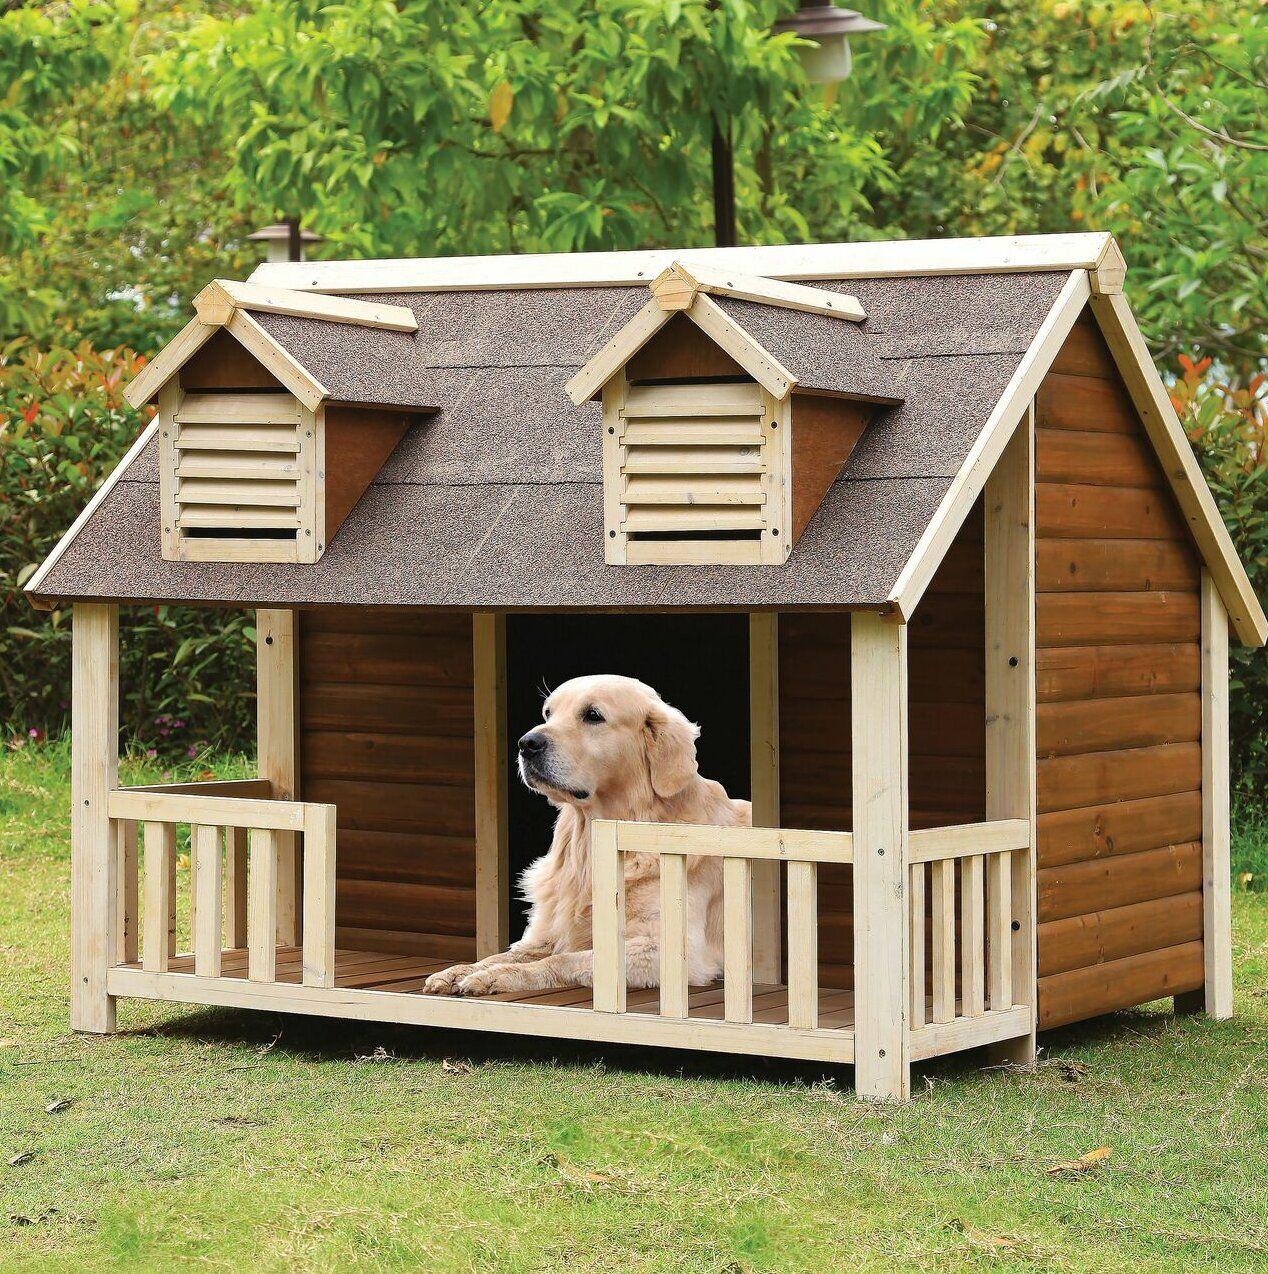 Rafos Dog House Cool Dog Houses Small Dog House Dog House Plans